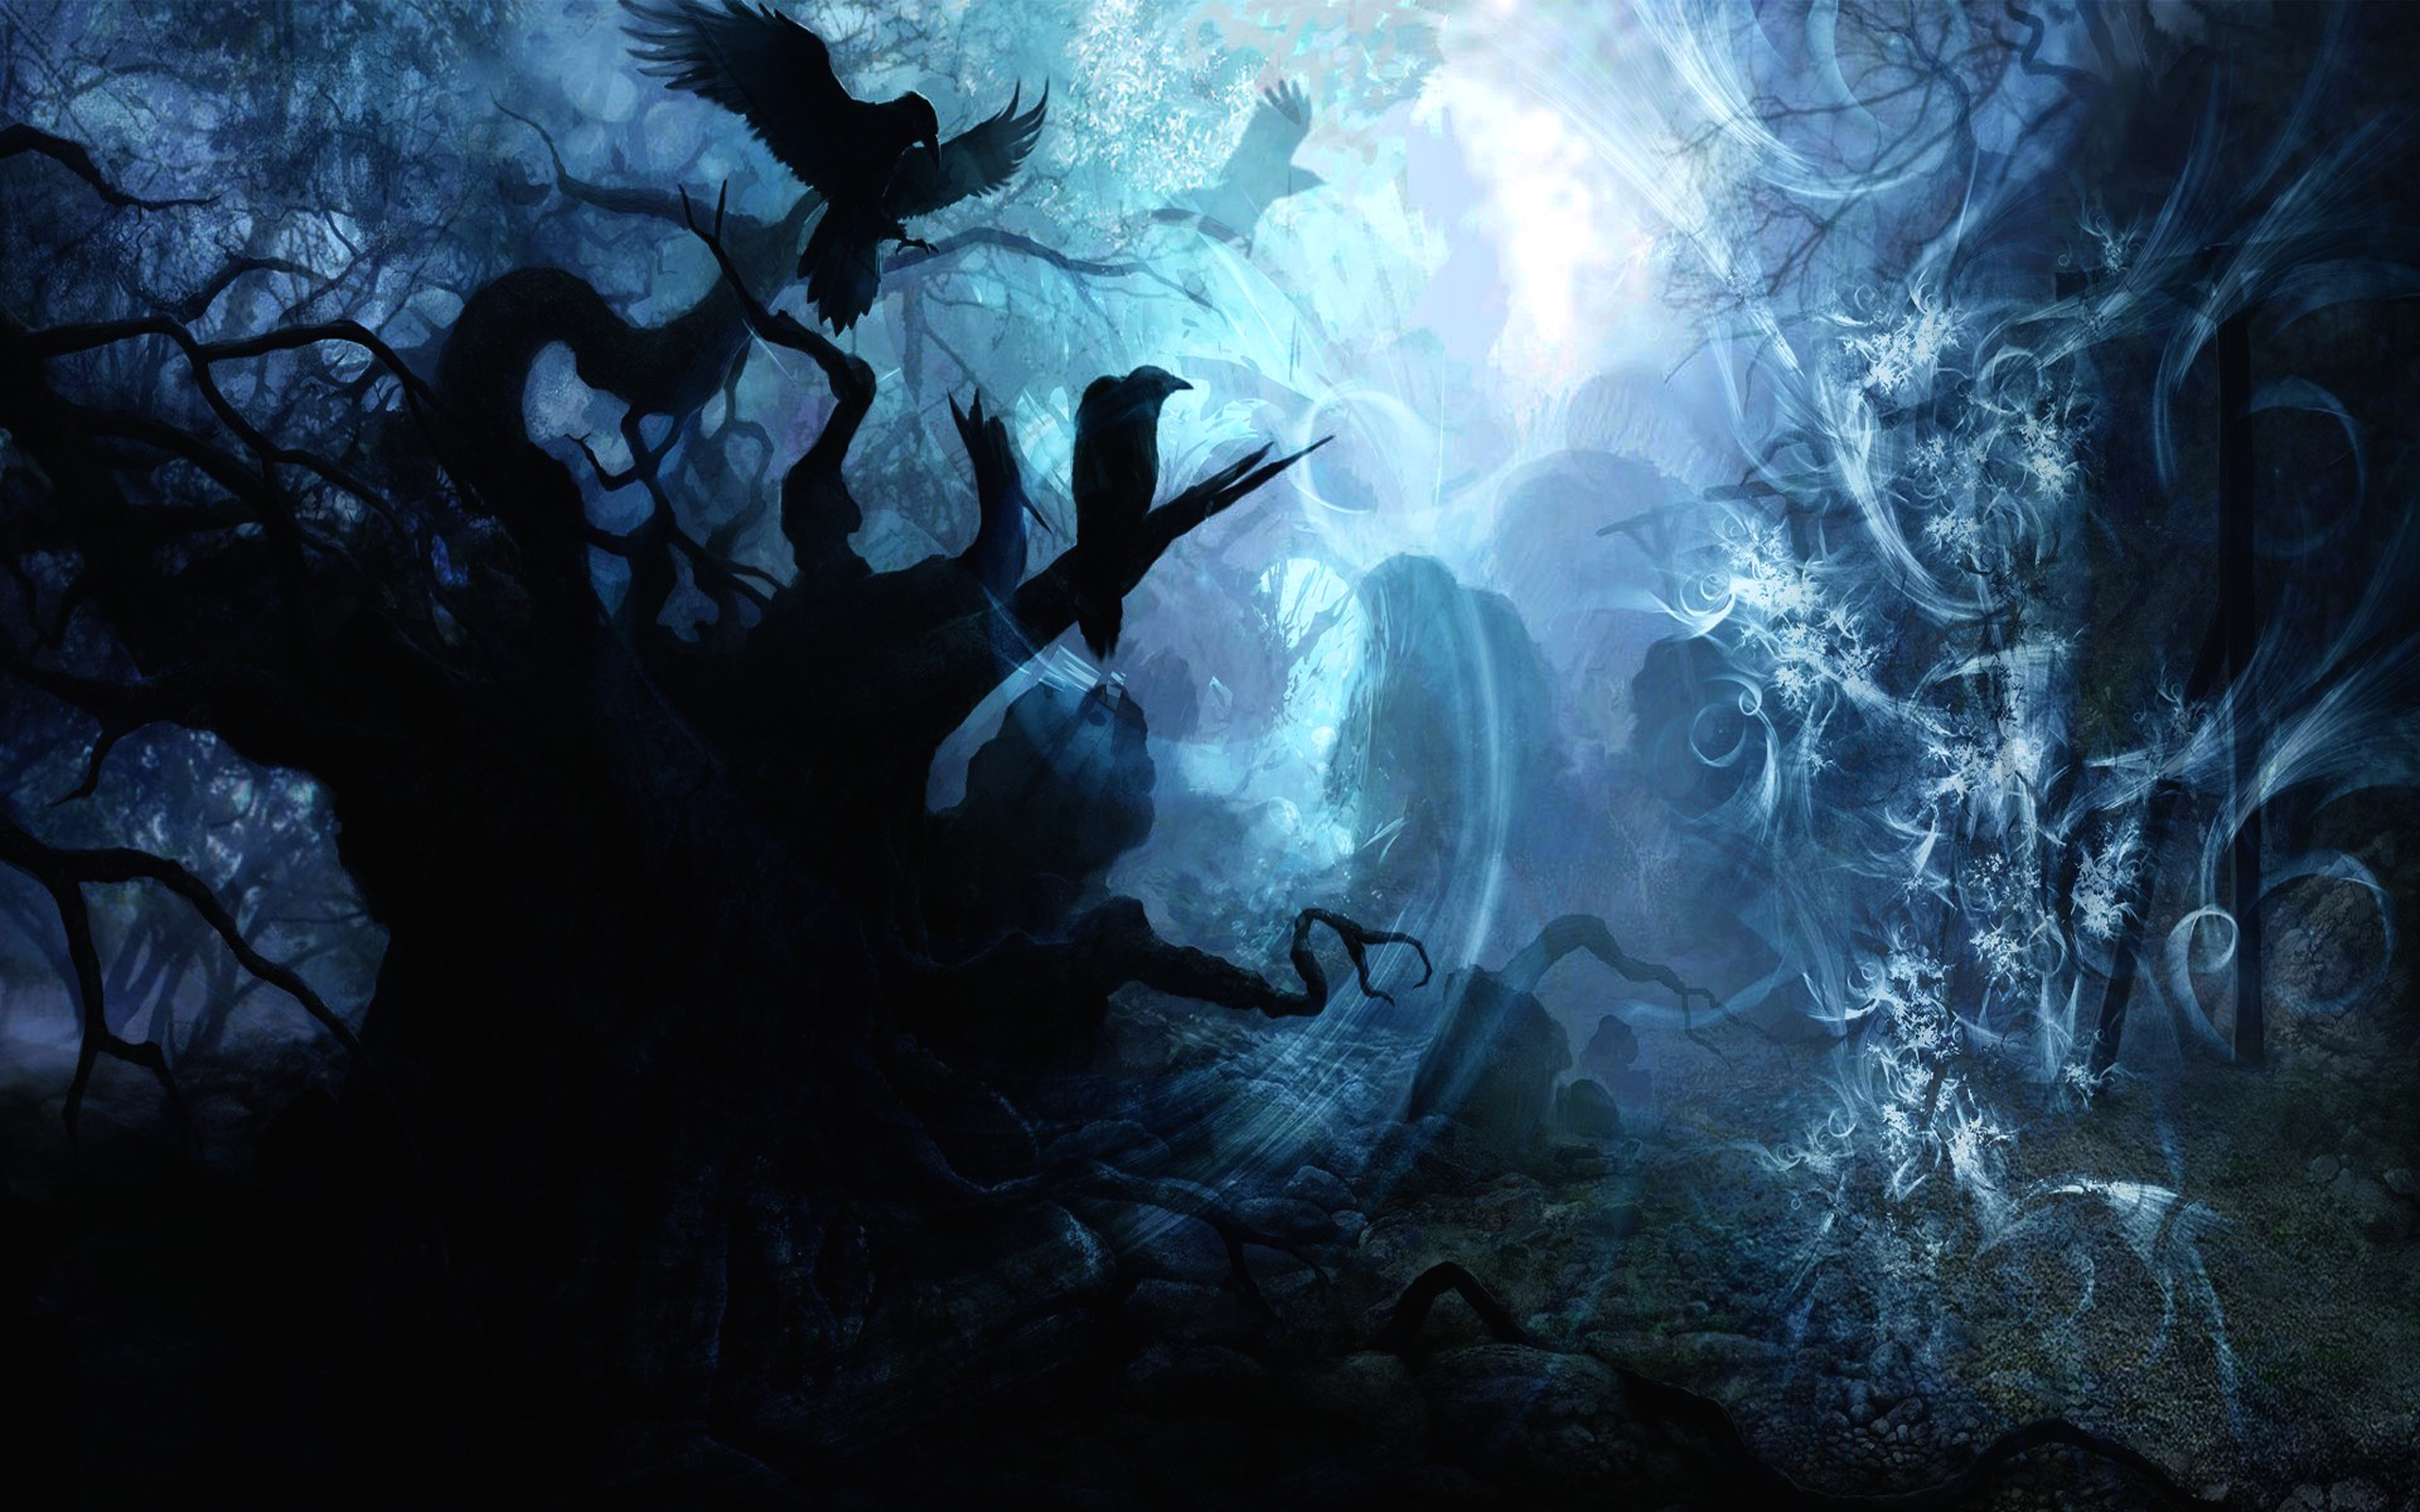 Free Download Dark Fantasy Wallpaper For Desktop 2560x1600 For